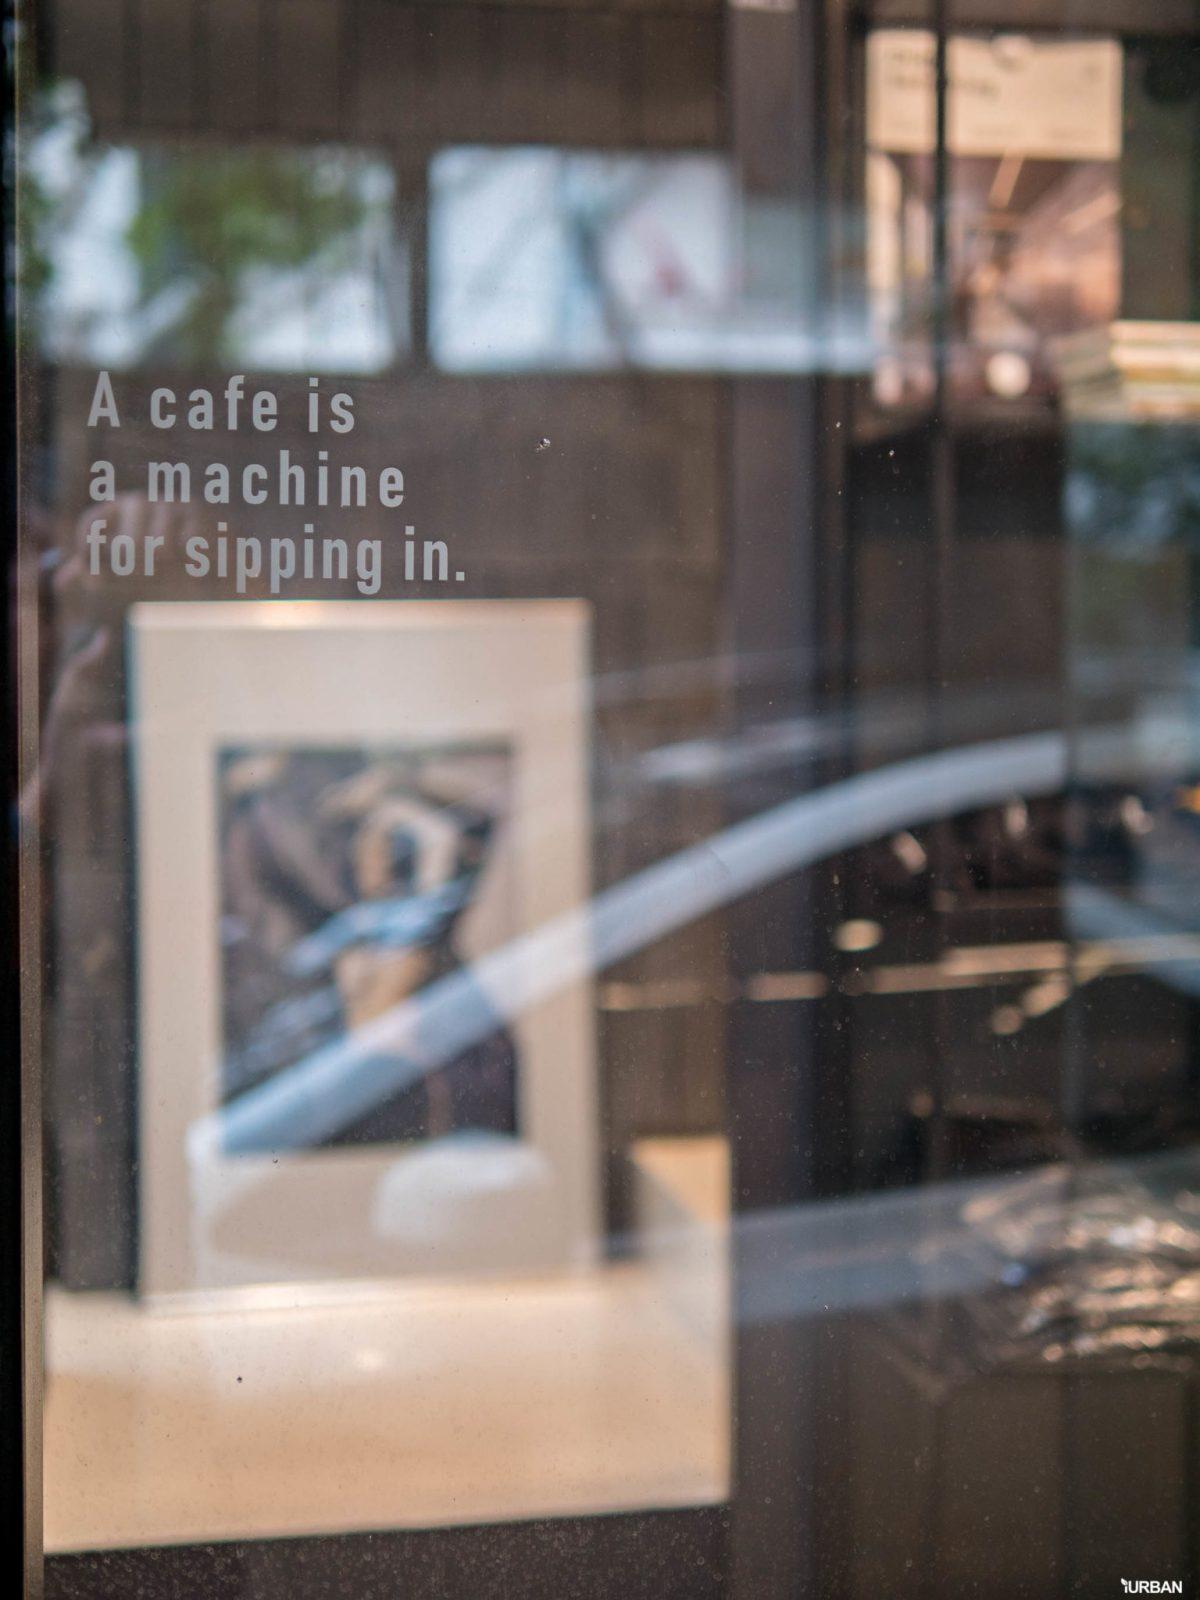 MODERNISM: ARCHITECT CAFE คาเฟ่ที่จะทำให้คุณได้ทึ่งพร้อมสัมผัสของจริงกับงานสถาปัตยกรรมสไตล์ modern 20 -